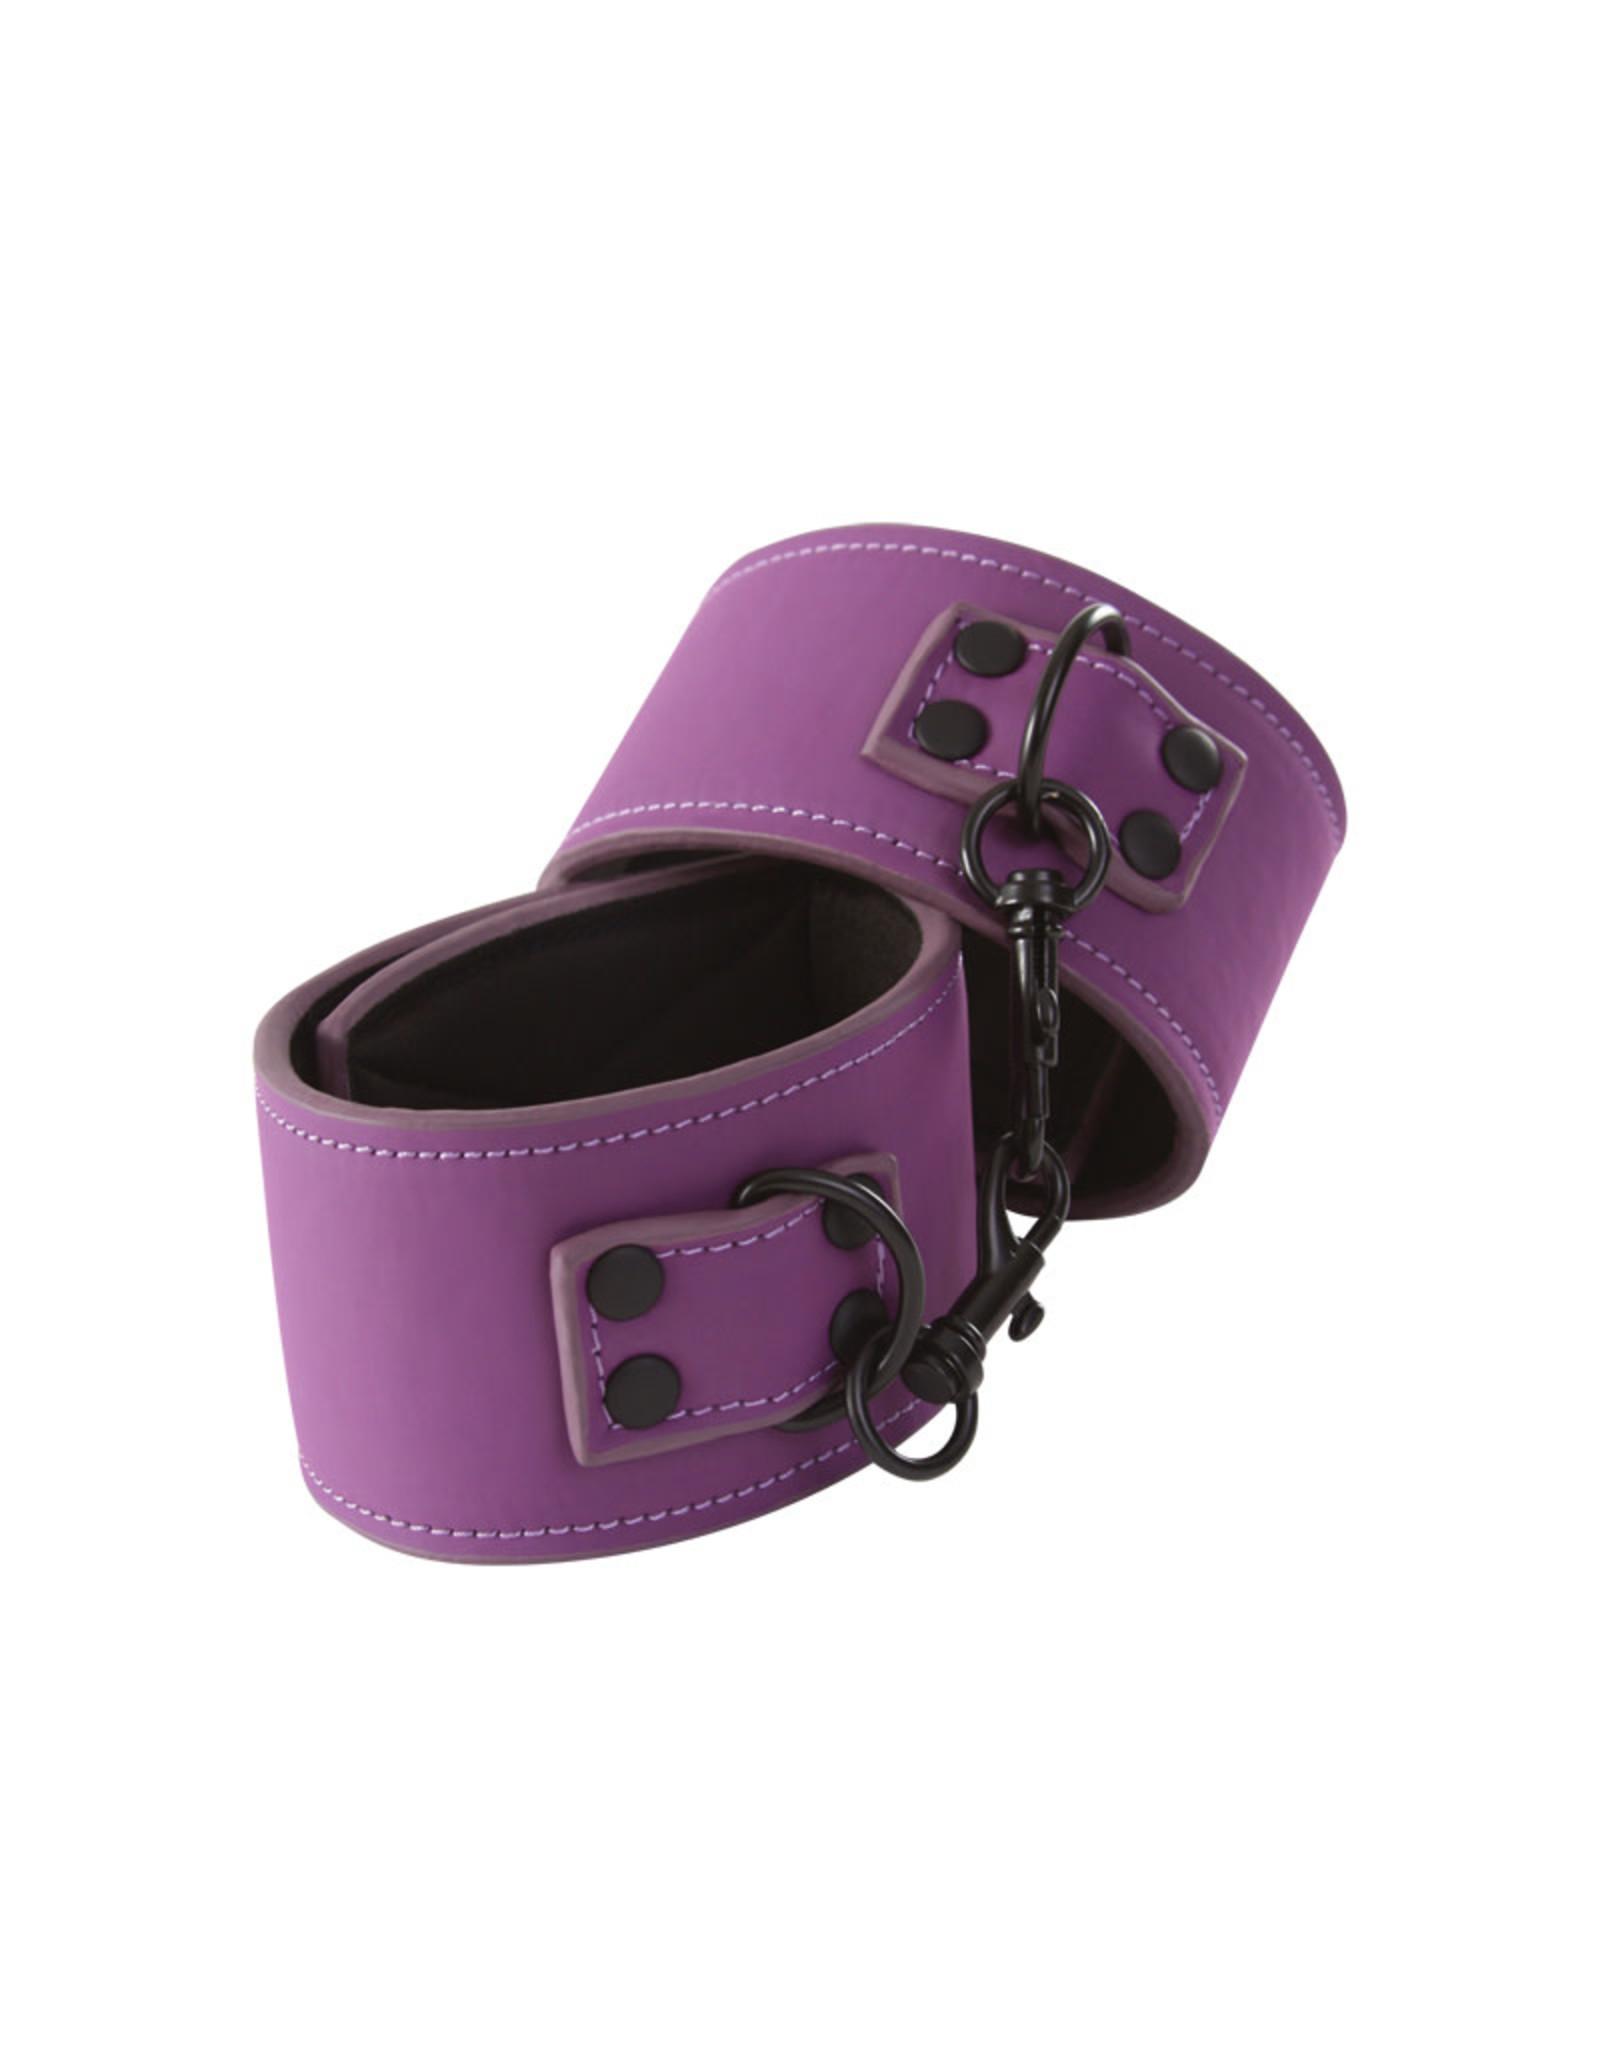 NS Novelties Lust - Bondage Wrist Cuffs - Purple